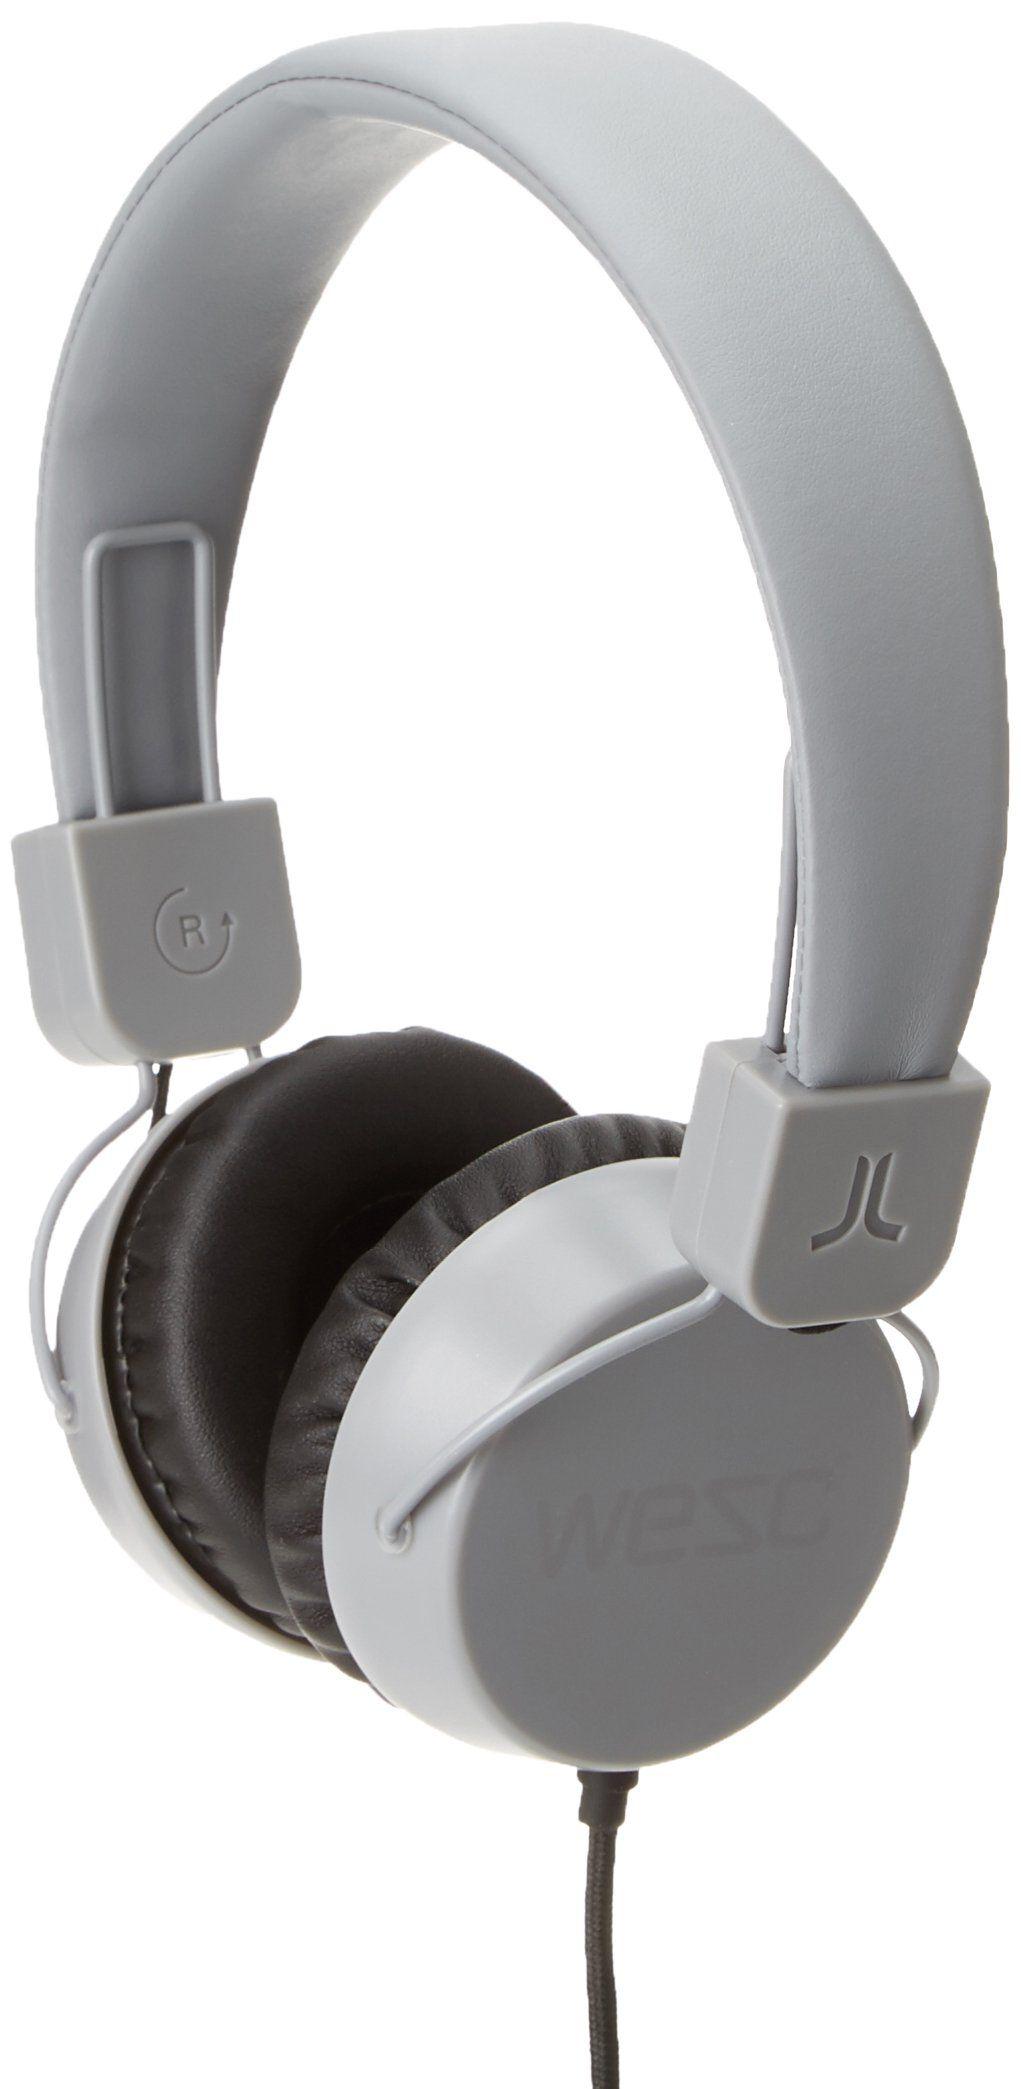 593a7224f63 Amazon.com: WeSC Unisex Pitston Street Headphones, Limestone: Electronics  Beats Headphones,